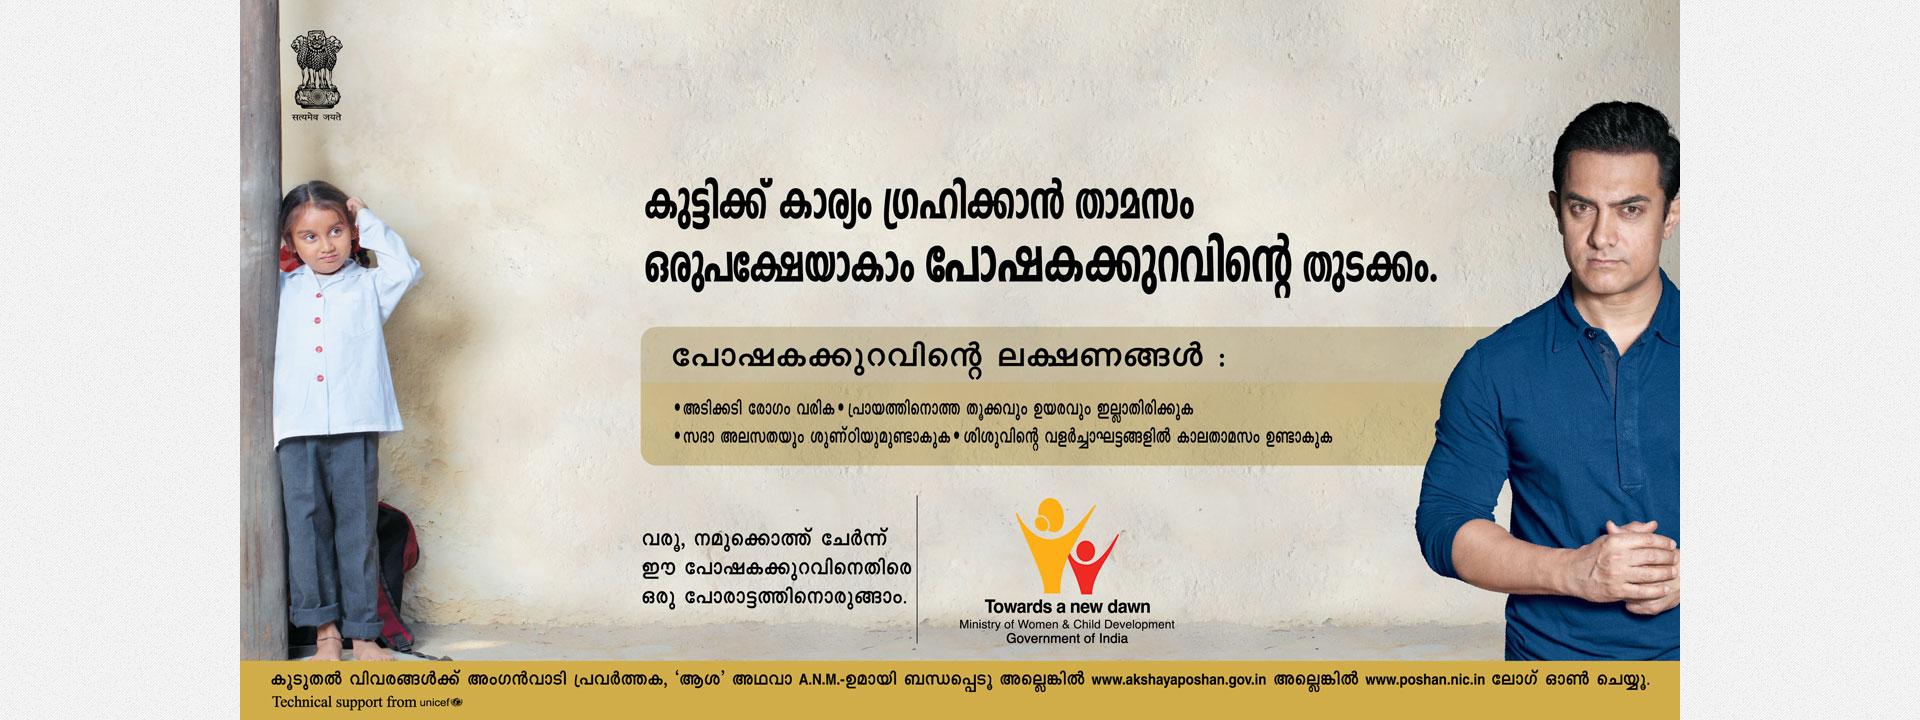 Malayalam - മലയാളം | Poshan | Nutrition, Food, Poverty